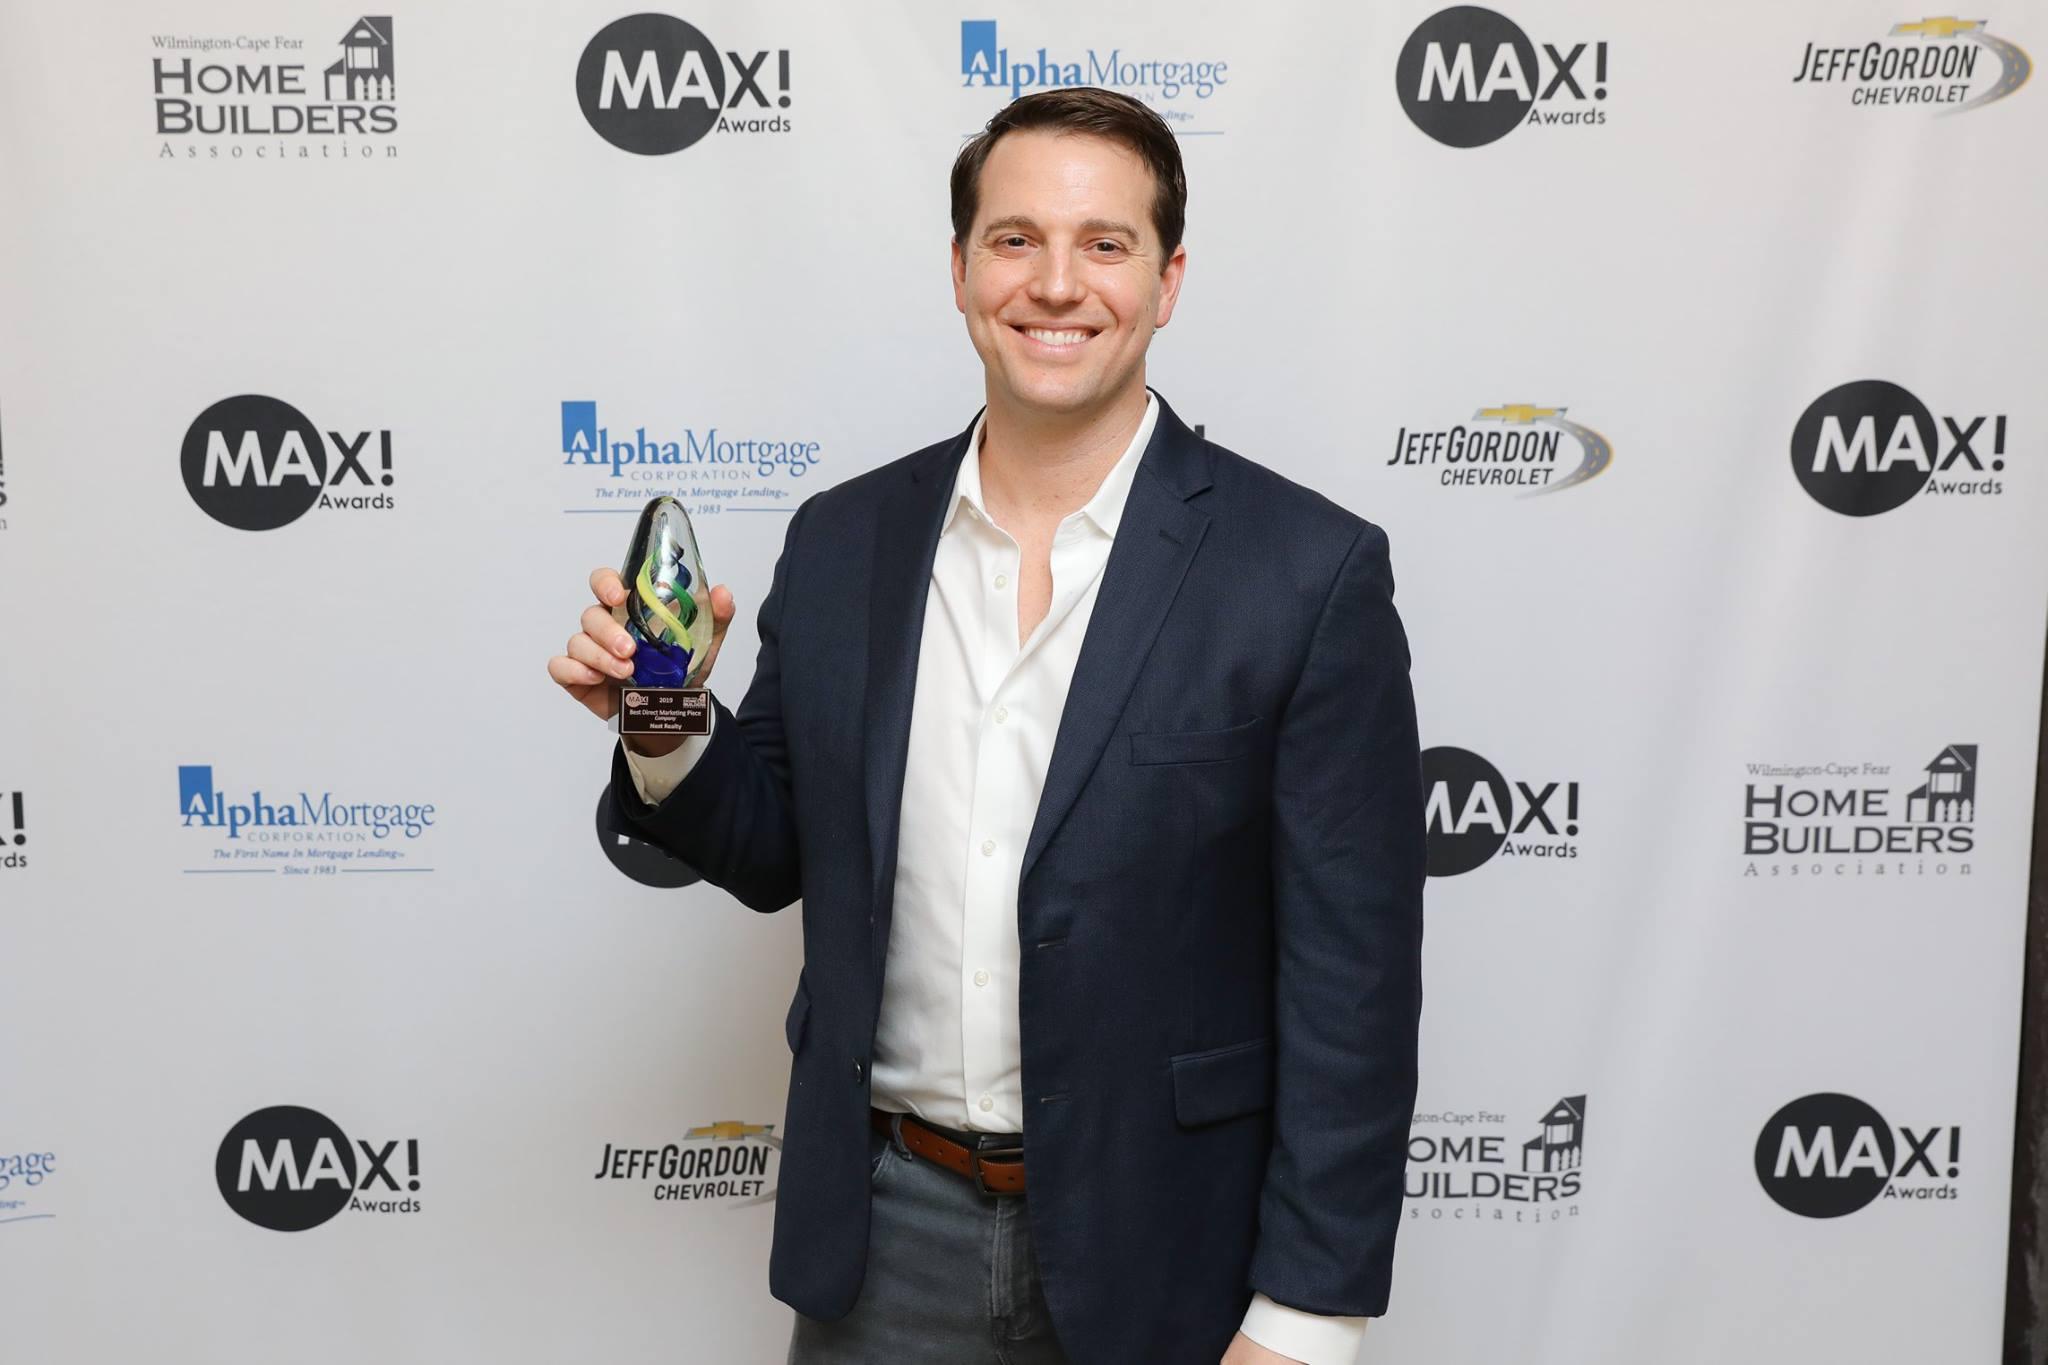 2019 Max! Awards